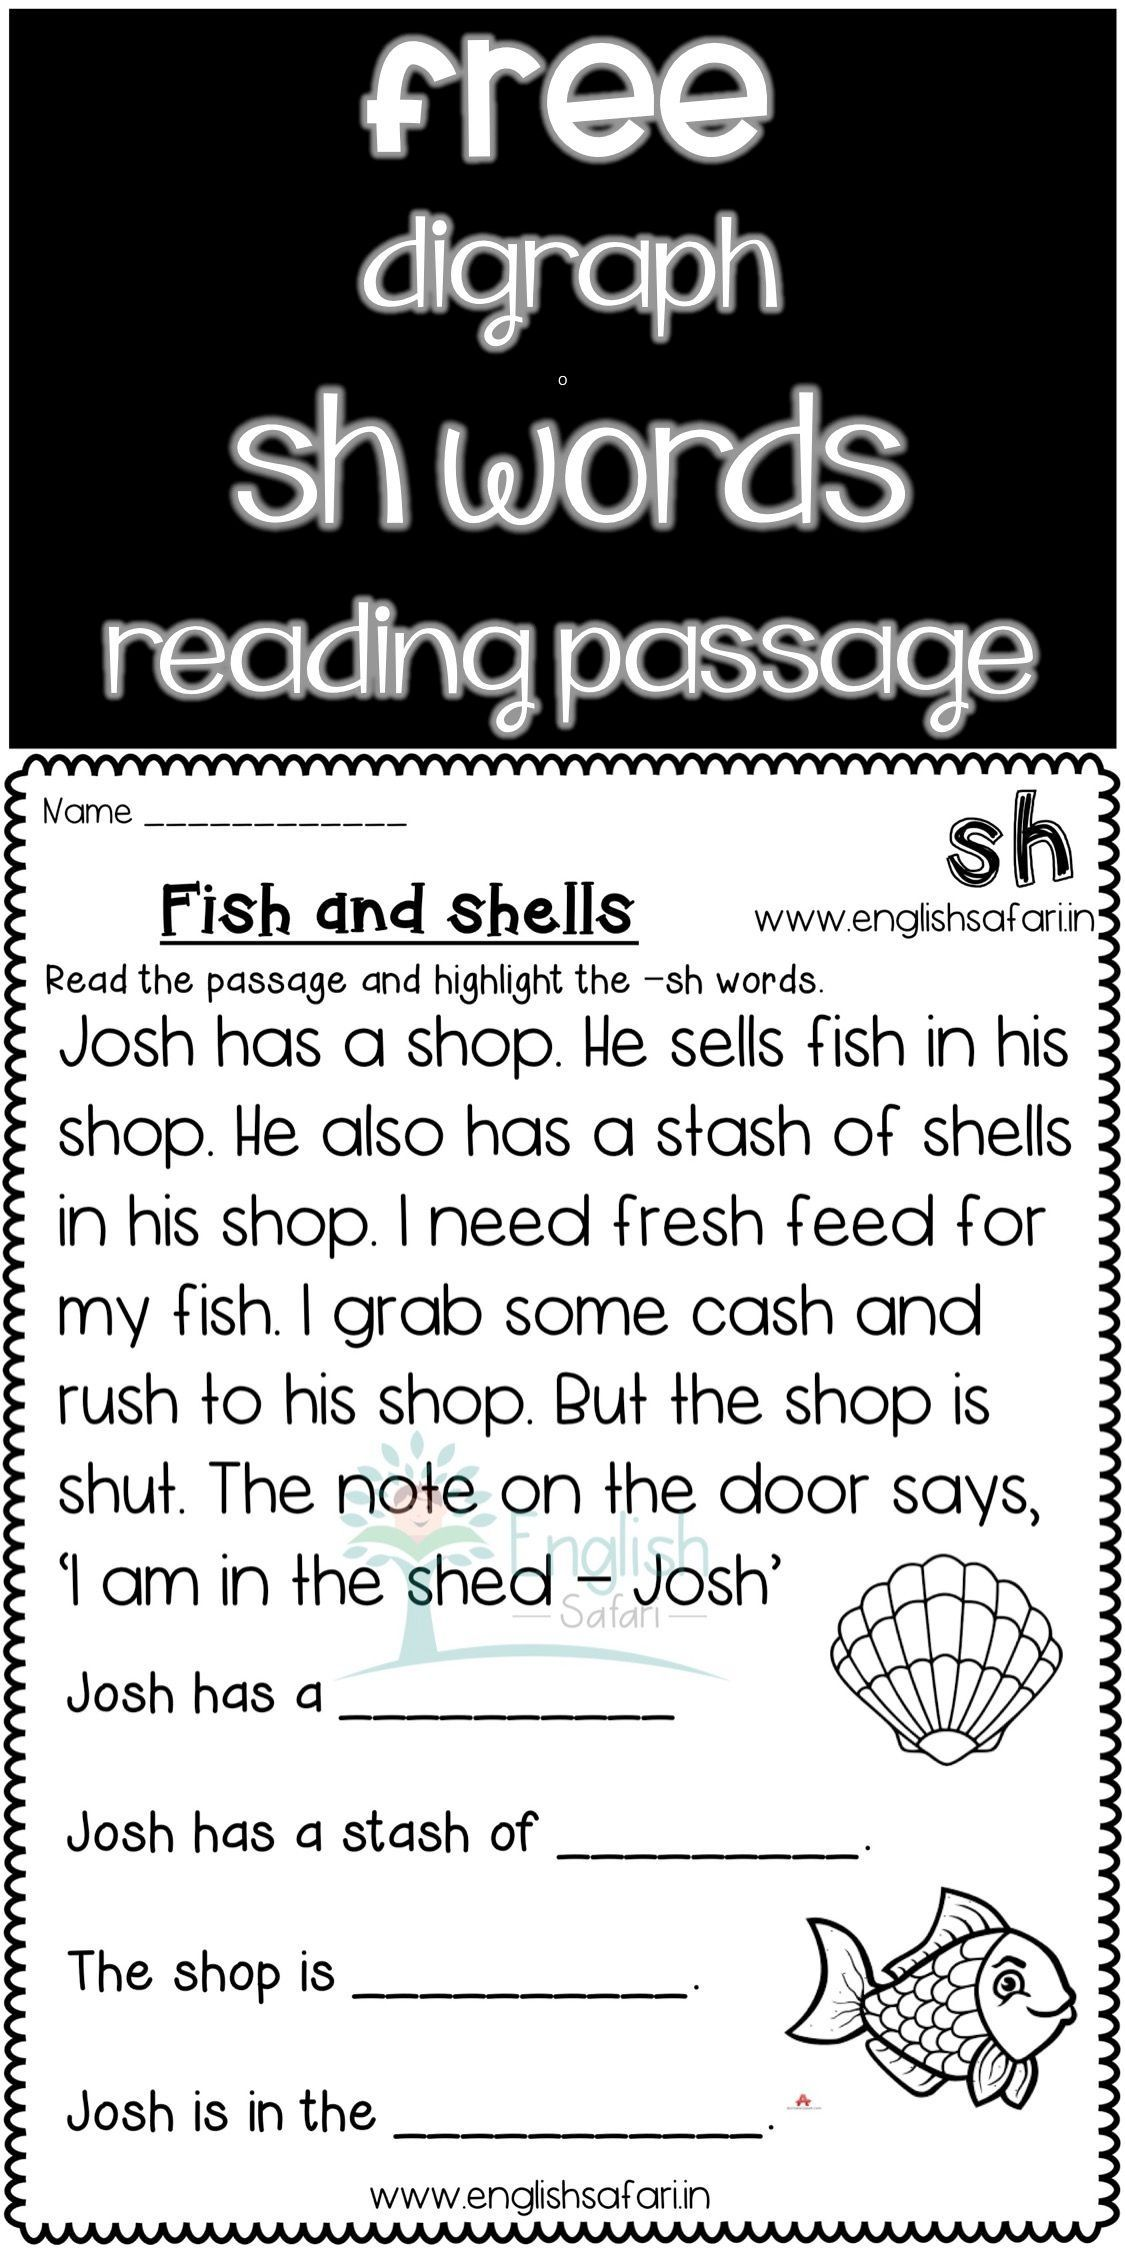 medium resolution of FREE** sh words reading comprehension www.worksheetsenglish.com   Phonics  reading